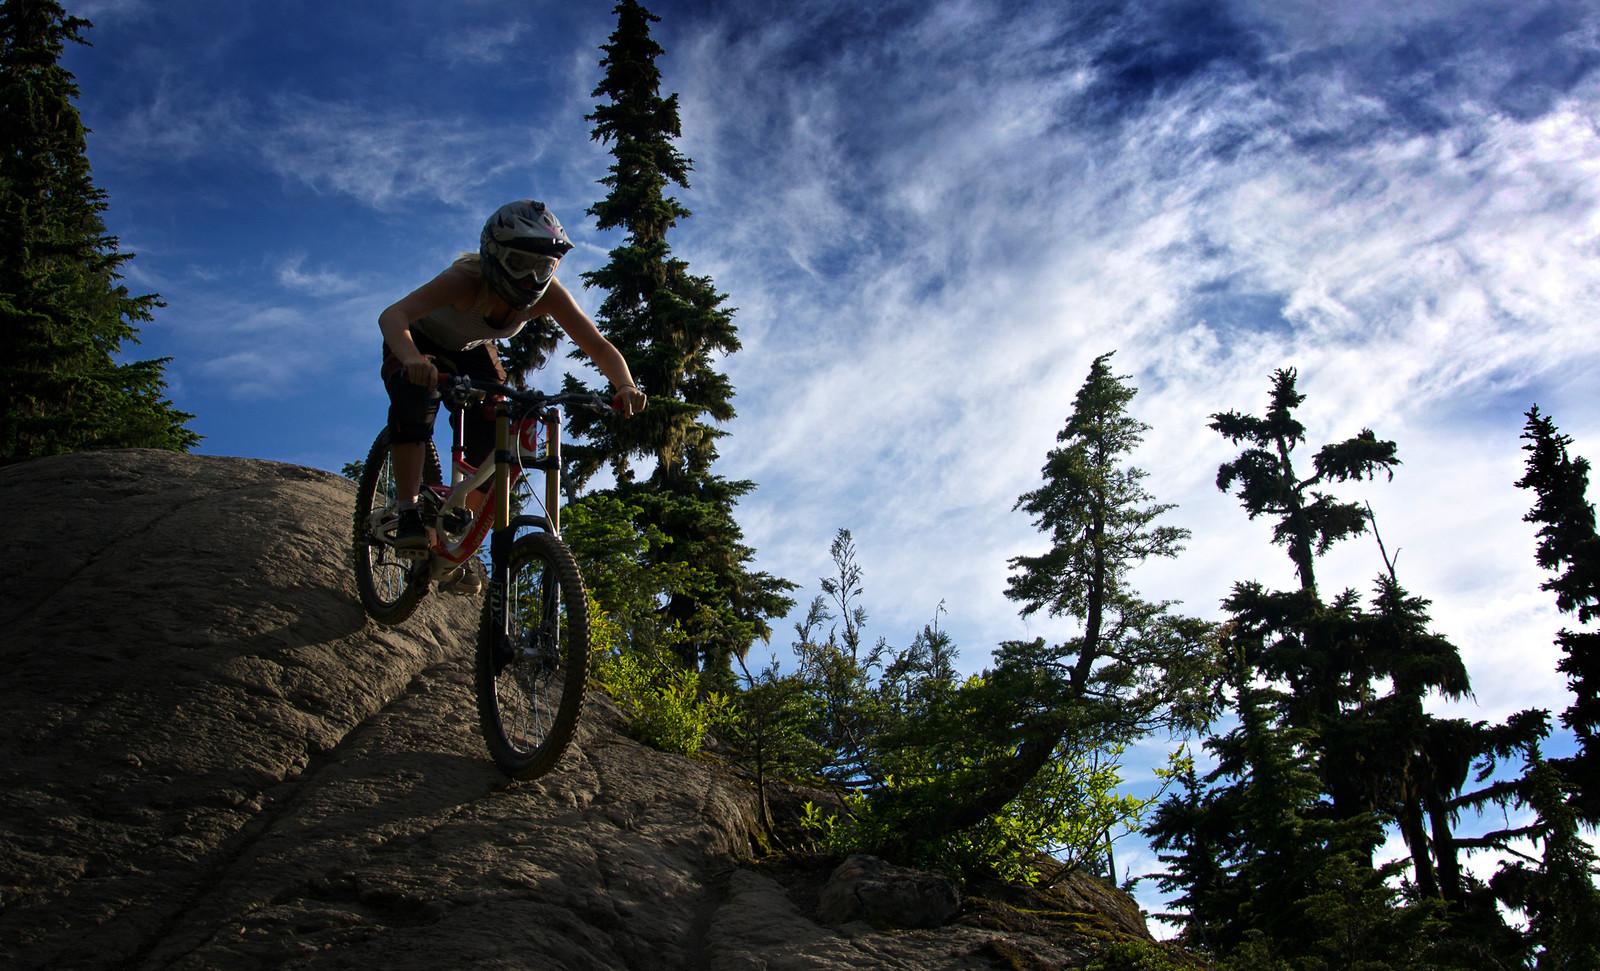 Big Rocks and Blue Sky - Dylan Kish - Mountain Biking Pictures - Vital MTB